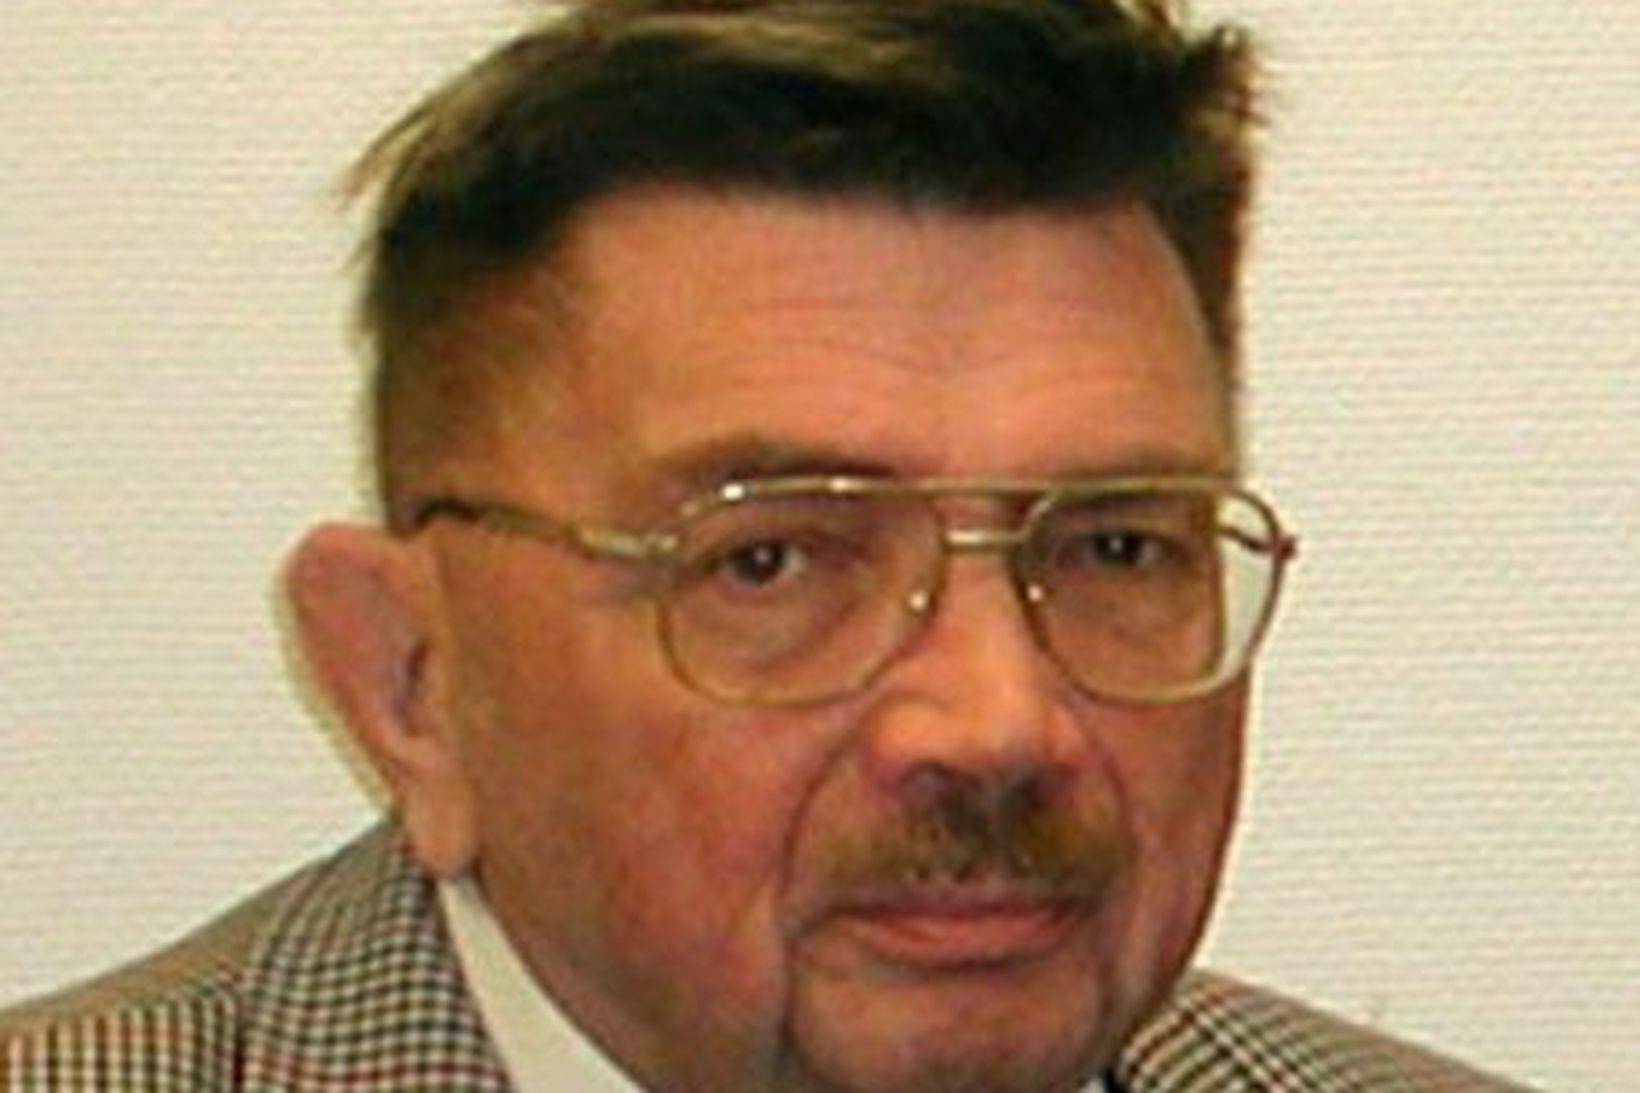 Benedikt Sigurður Benedikz